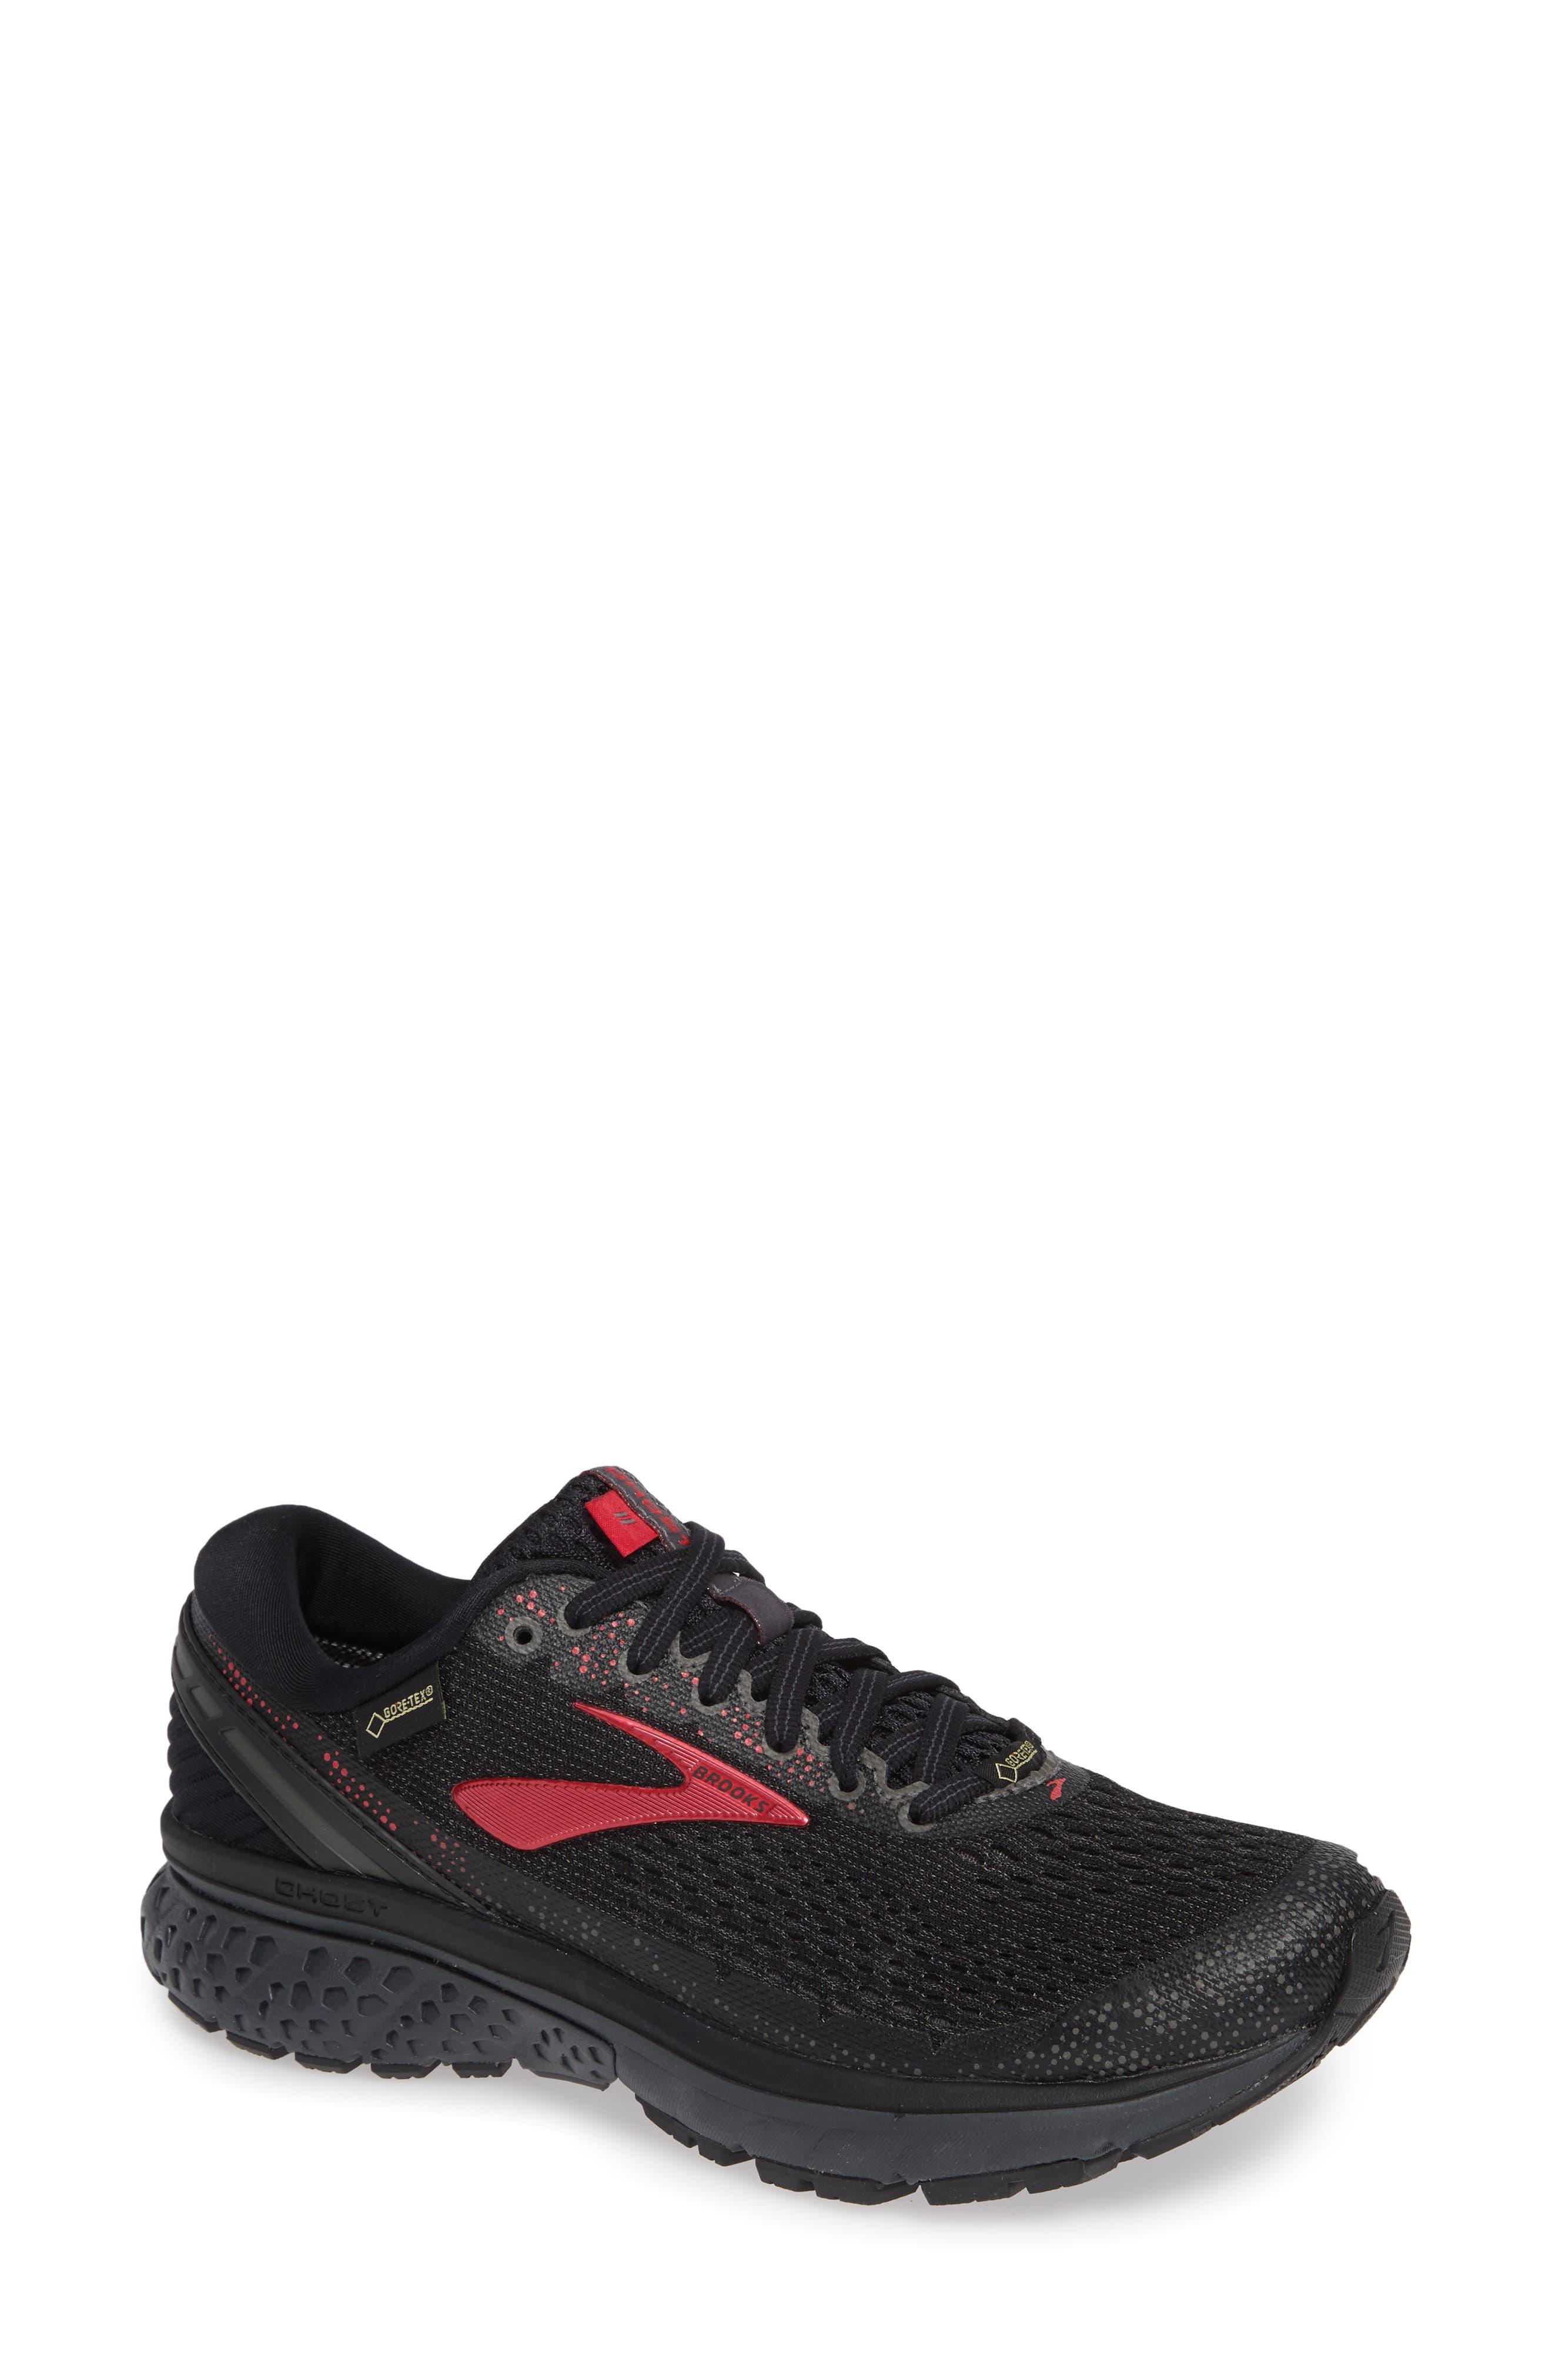 Ghost 11 Running Shoe,                         Main,                         color, BLACK/ PINK/ EBONY